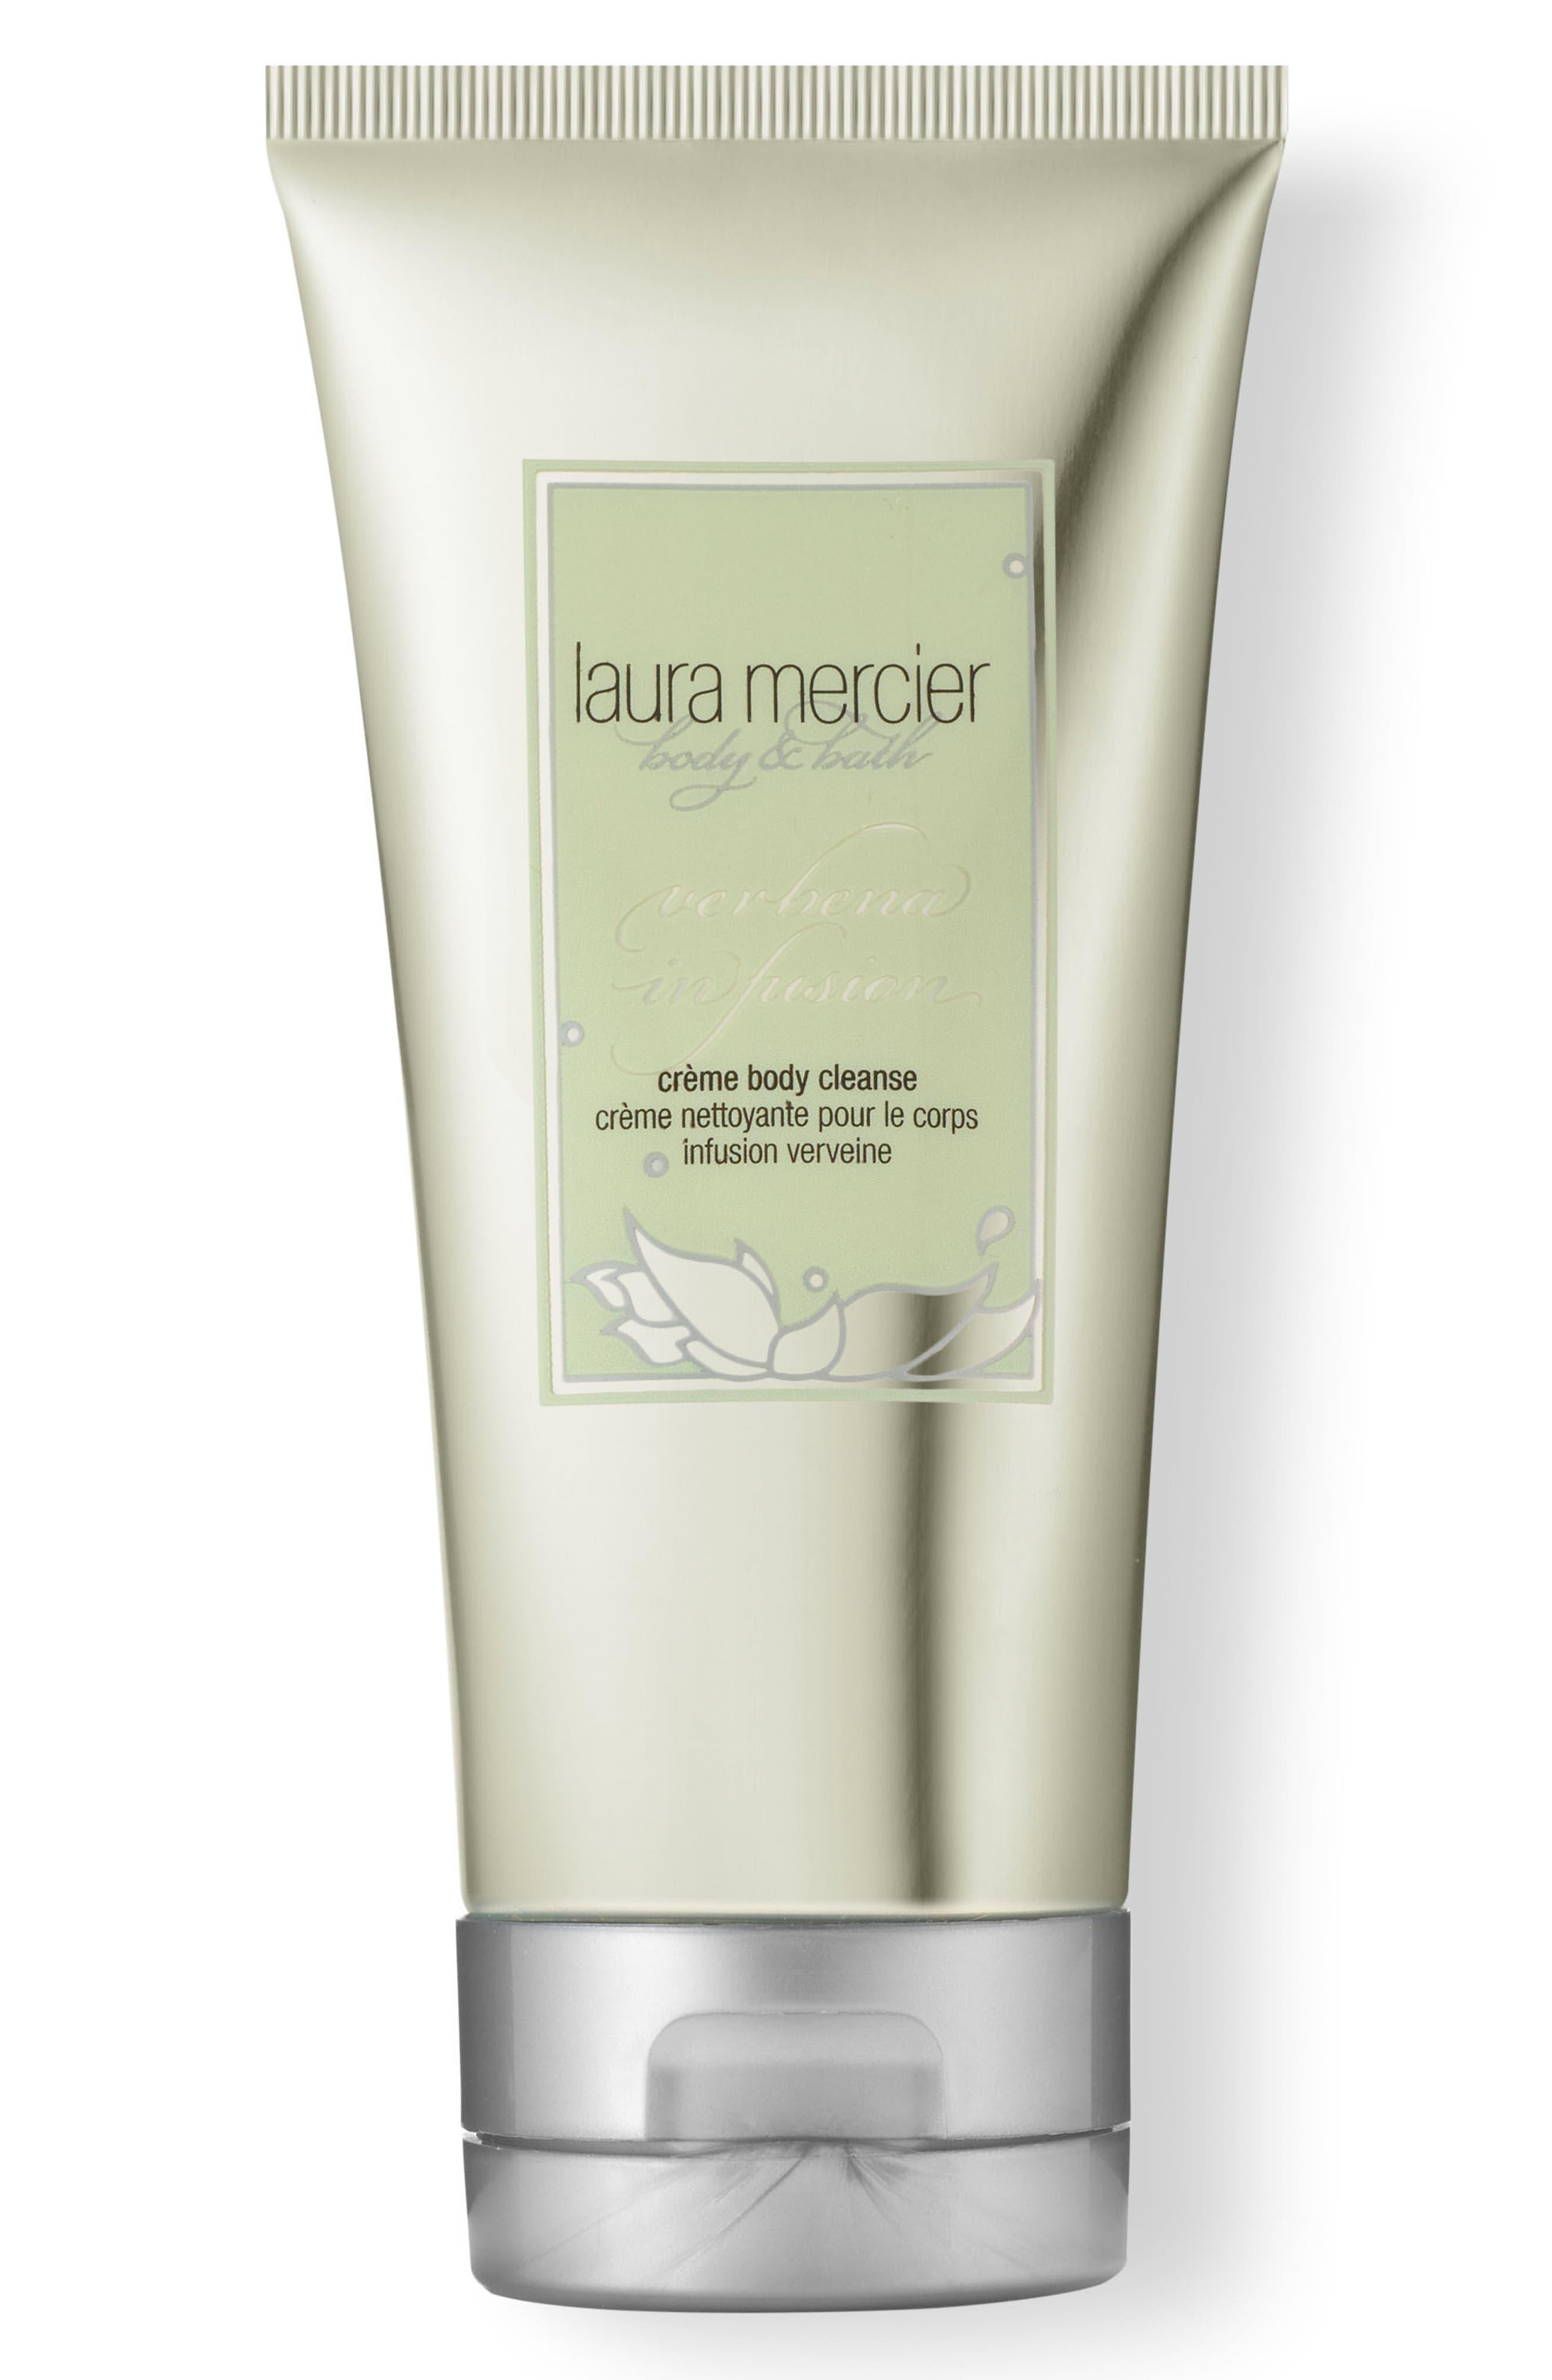 Main Image - Laura Mercier 'Verbena Infusion' Creme Body Cleanse